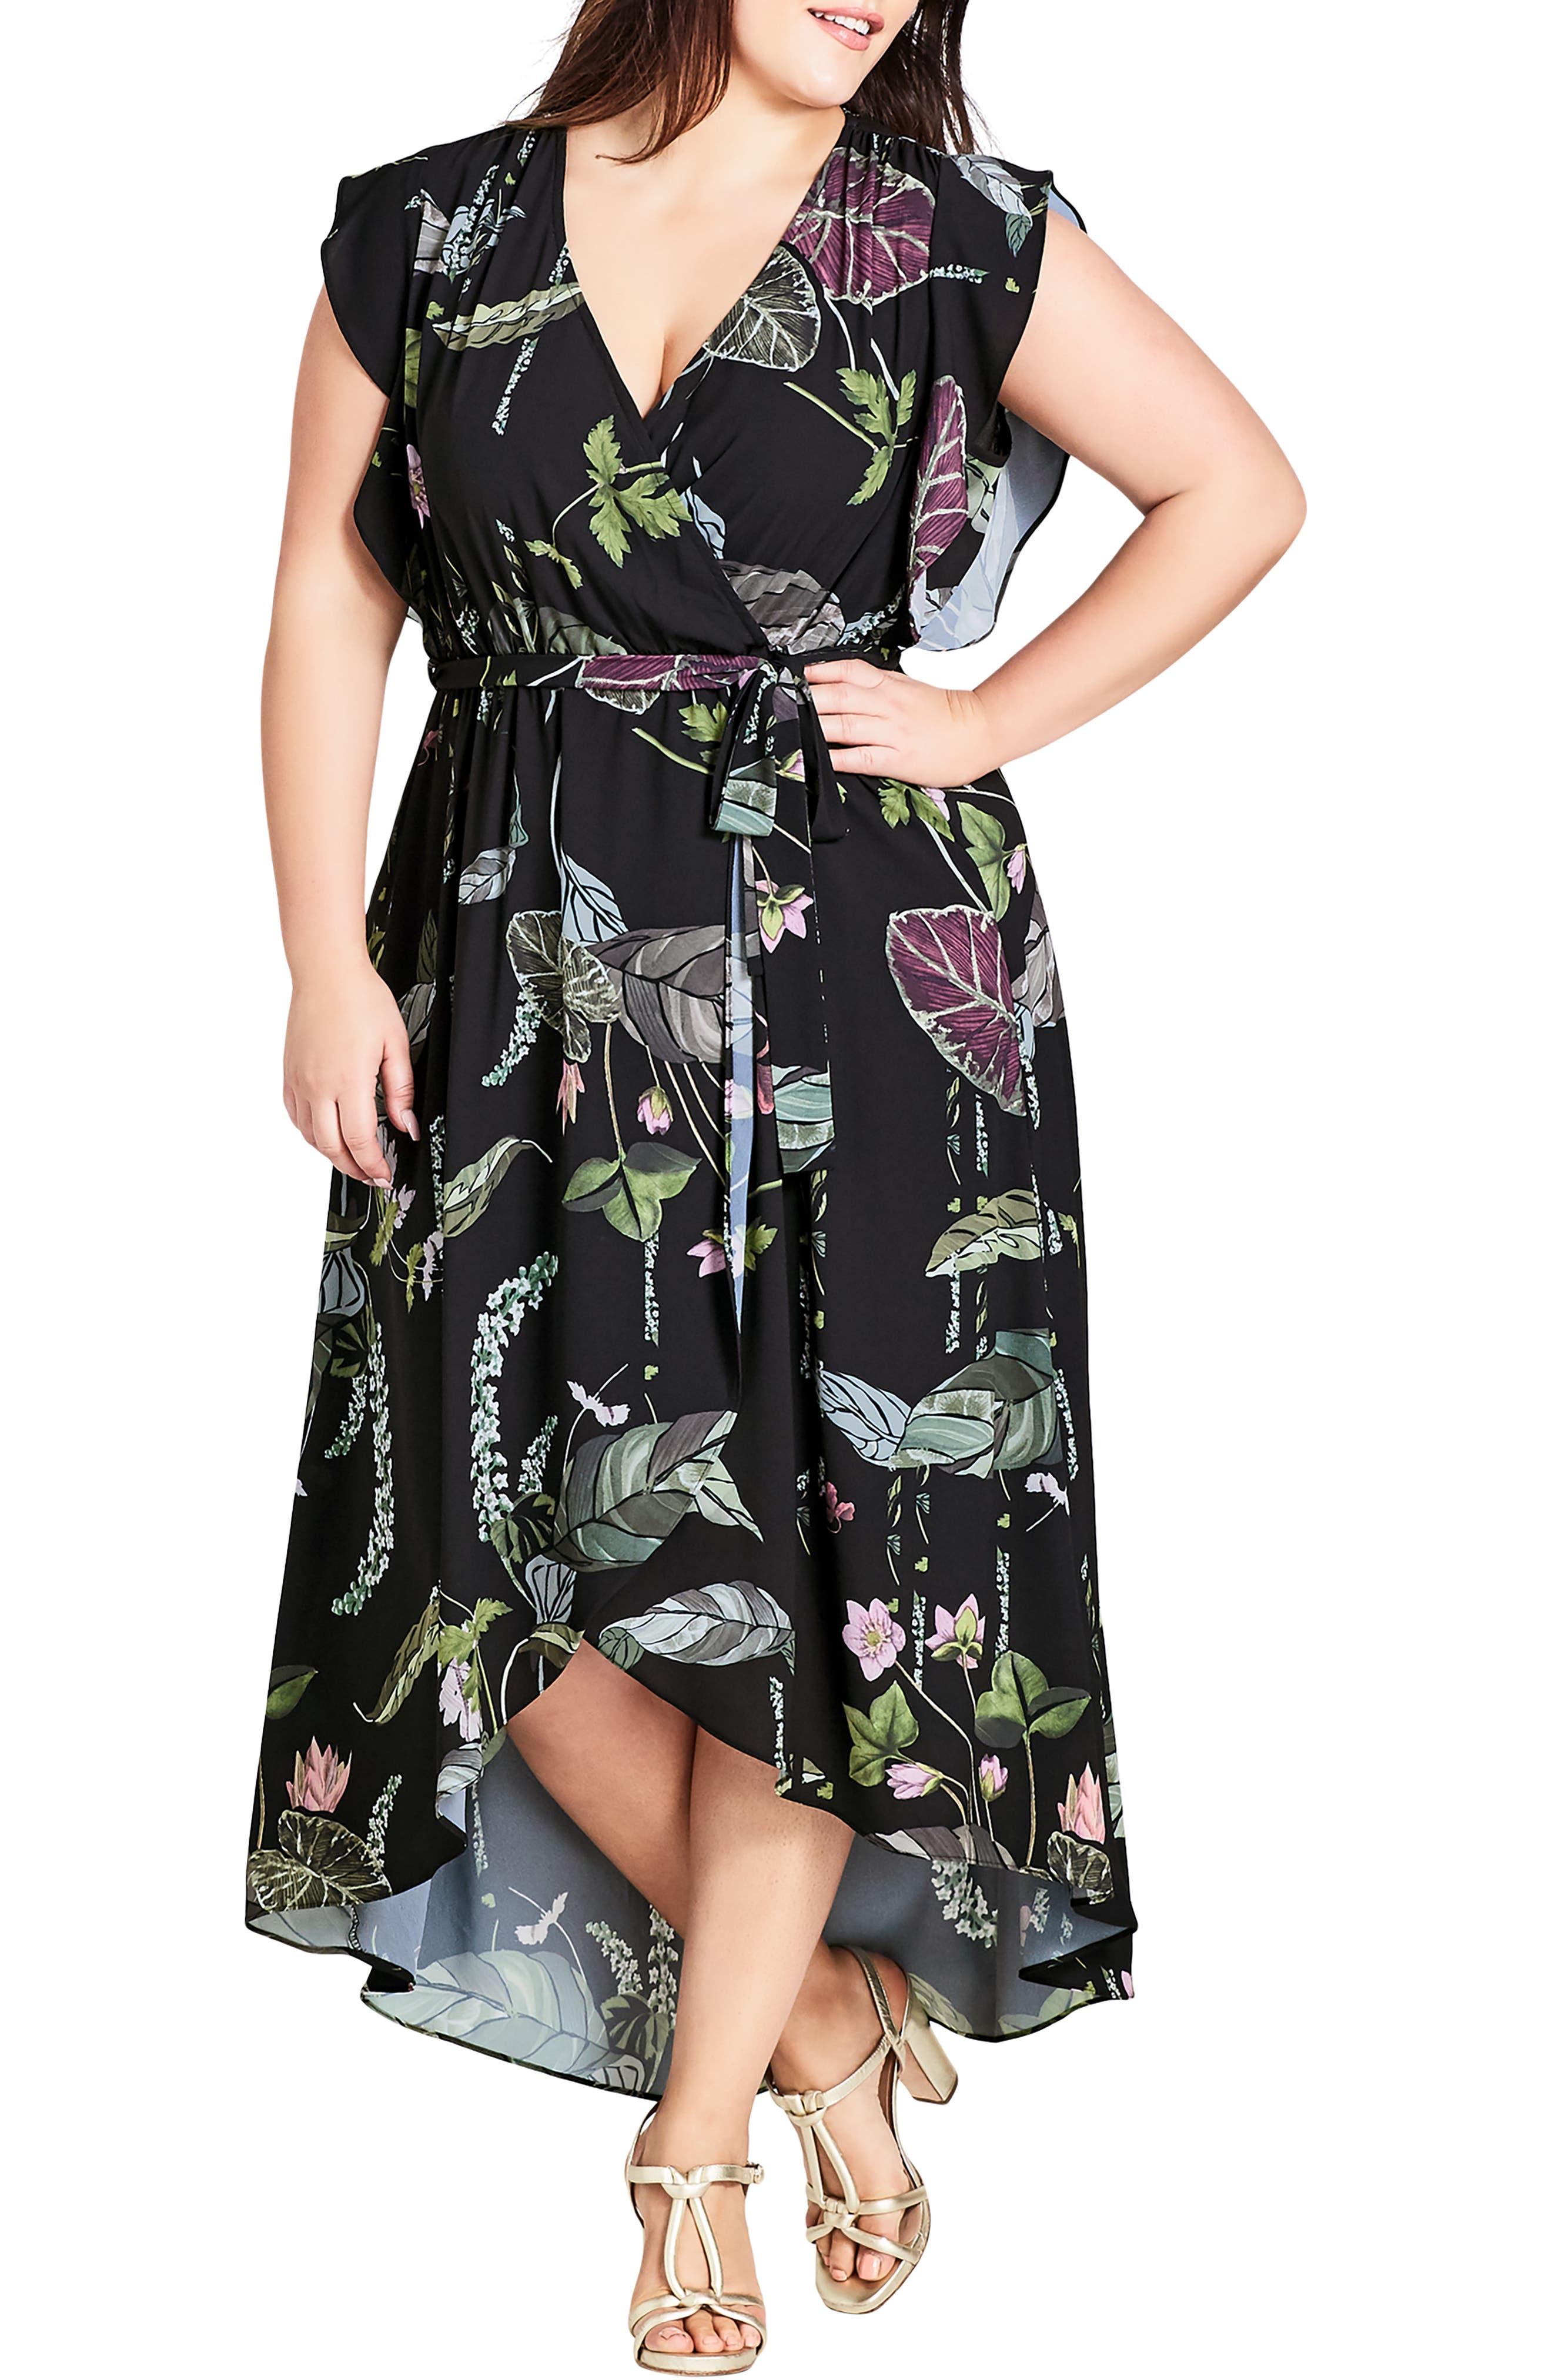 Plus Size City Chic Lily Pad Faux Wrap Maxi Dress, Black